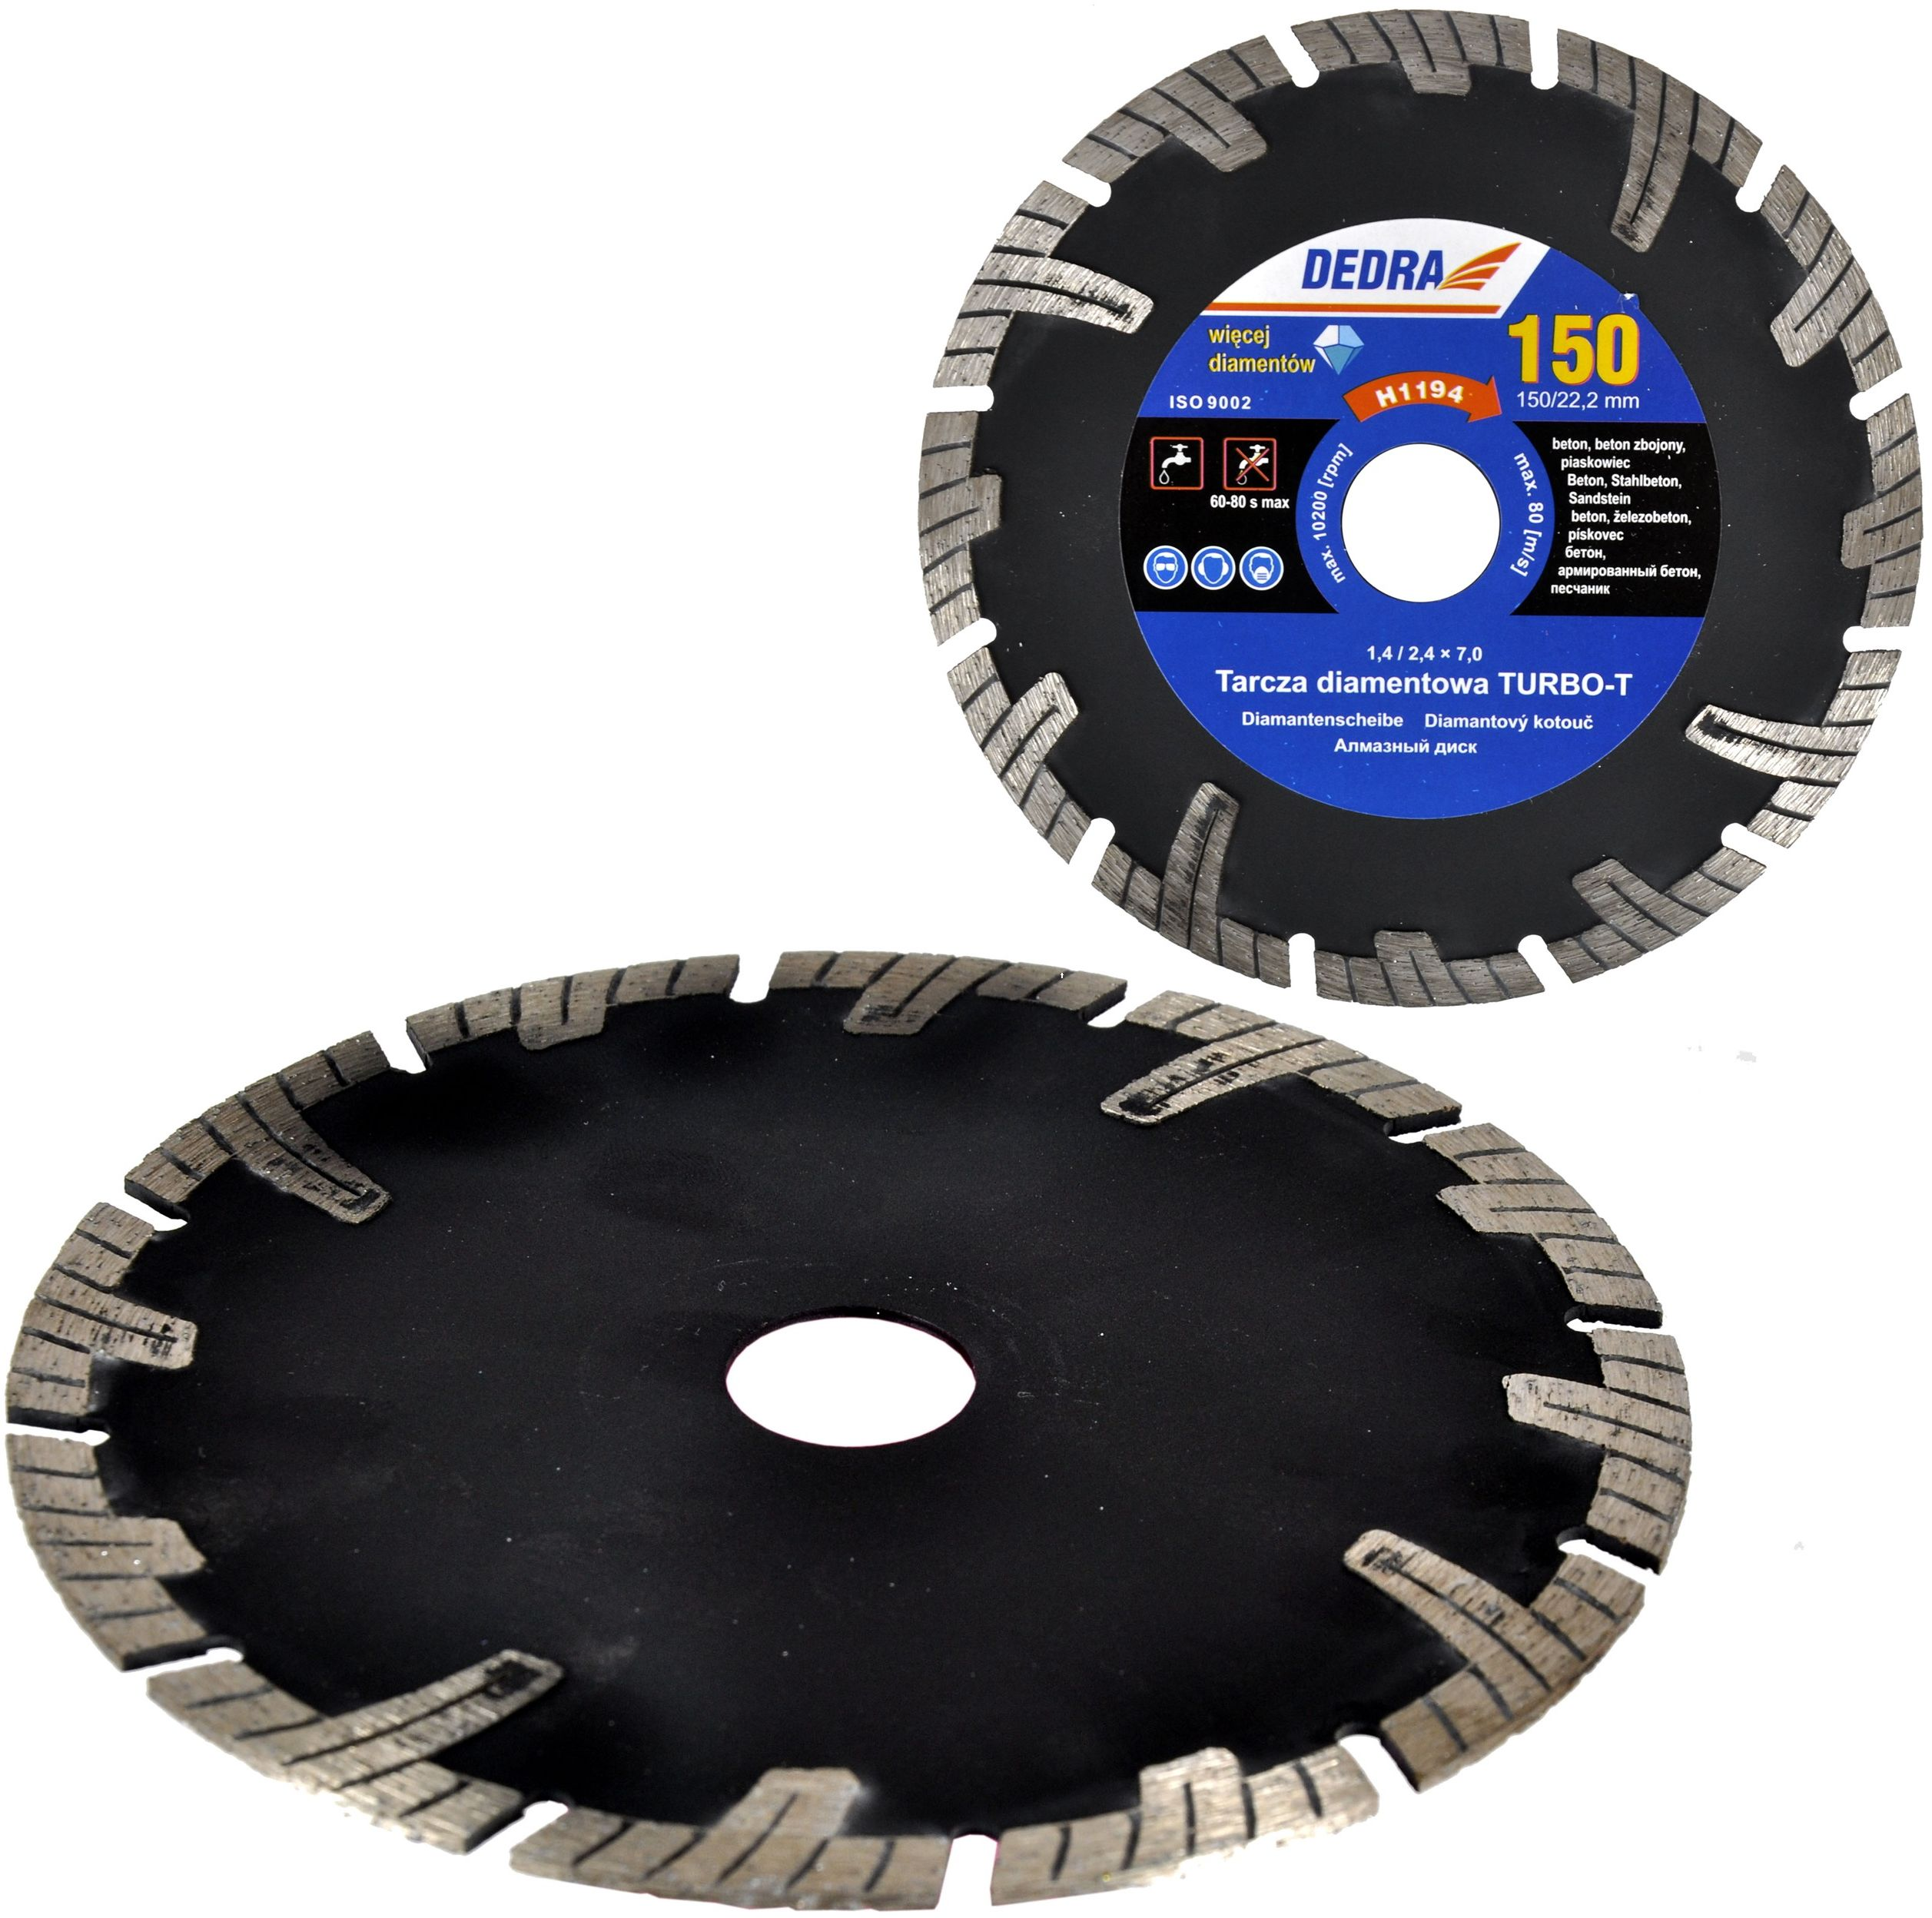 Piła tarczowa tarcza diamentowa 150mm 22,2 betonu